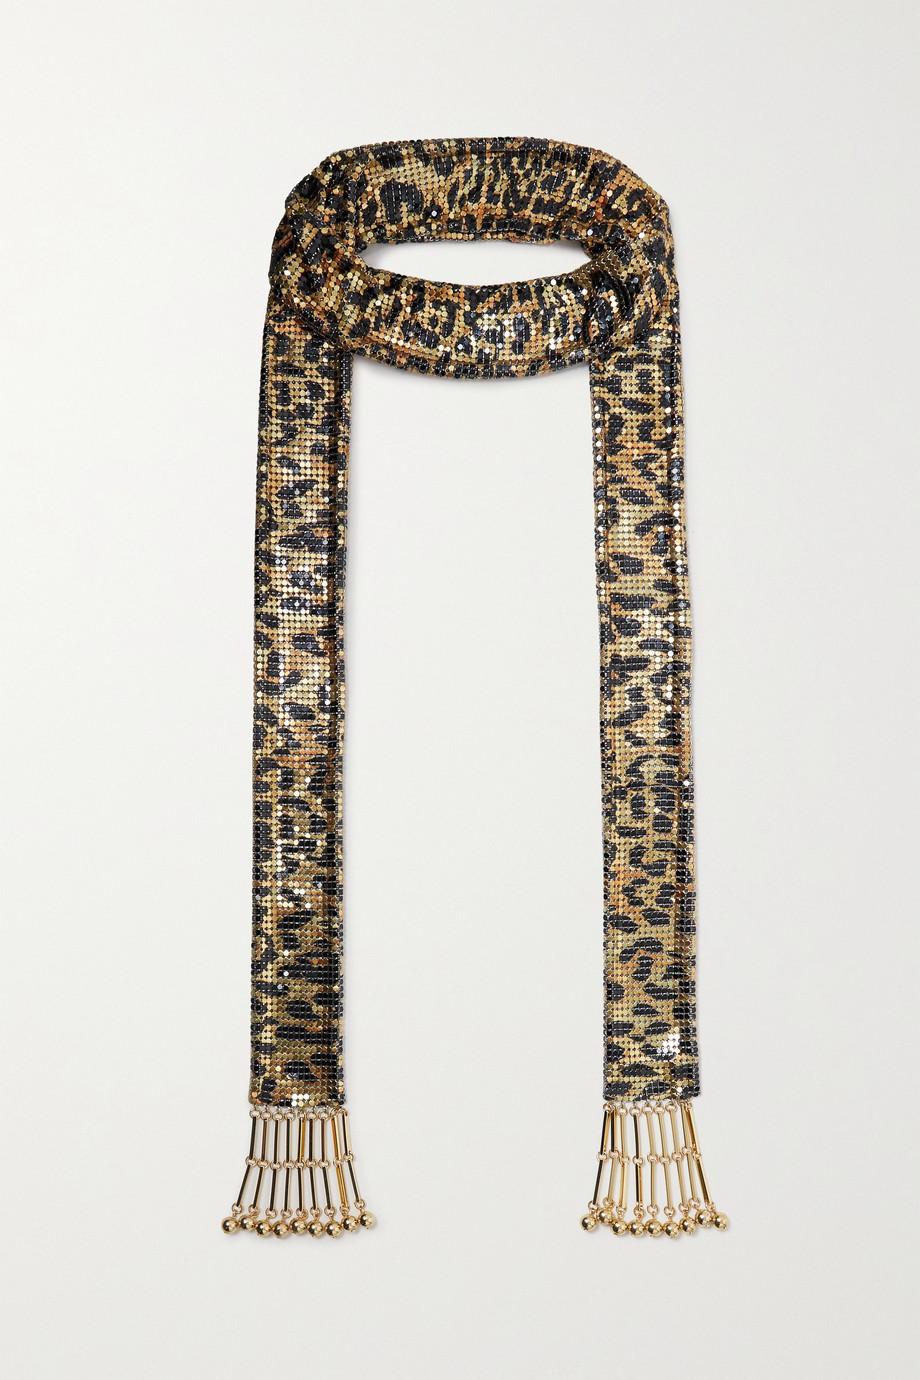 Paco Rabanne Pixel tasseled leopard-print chainmail scarf